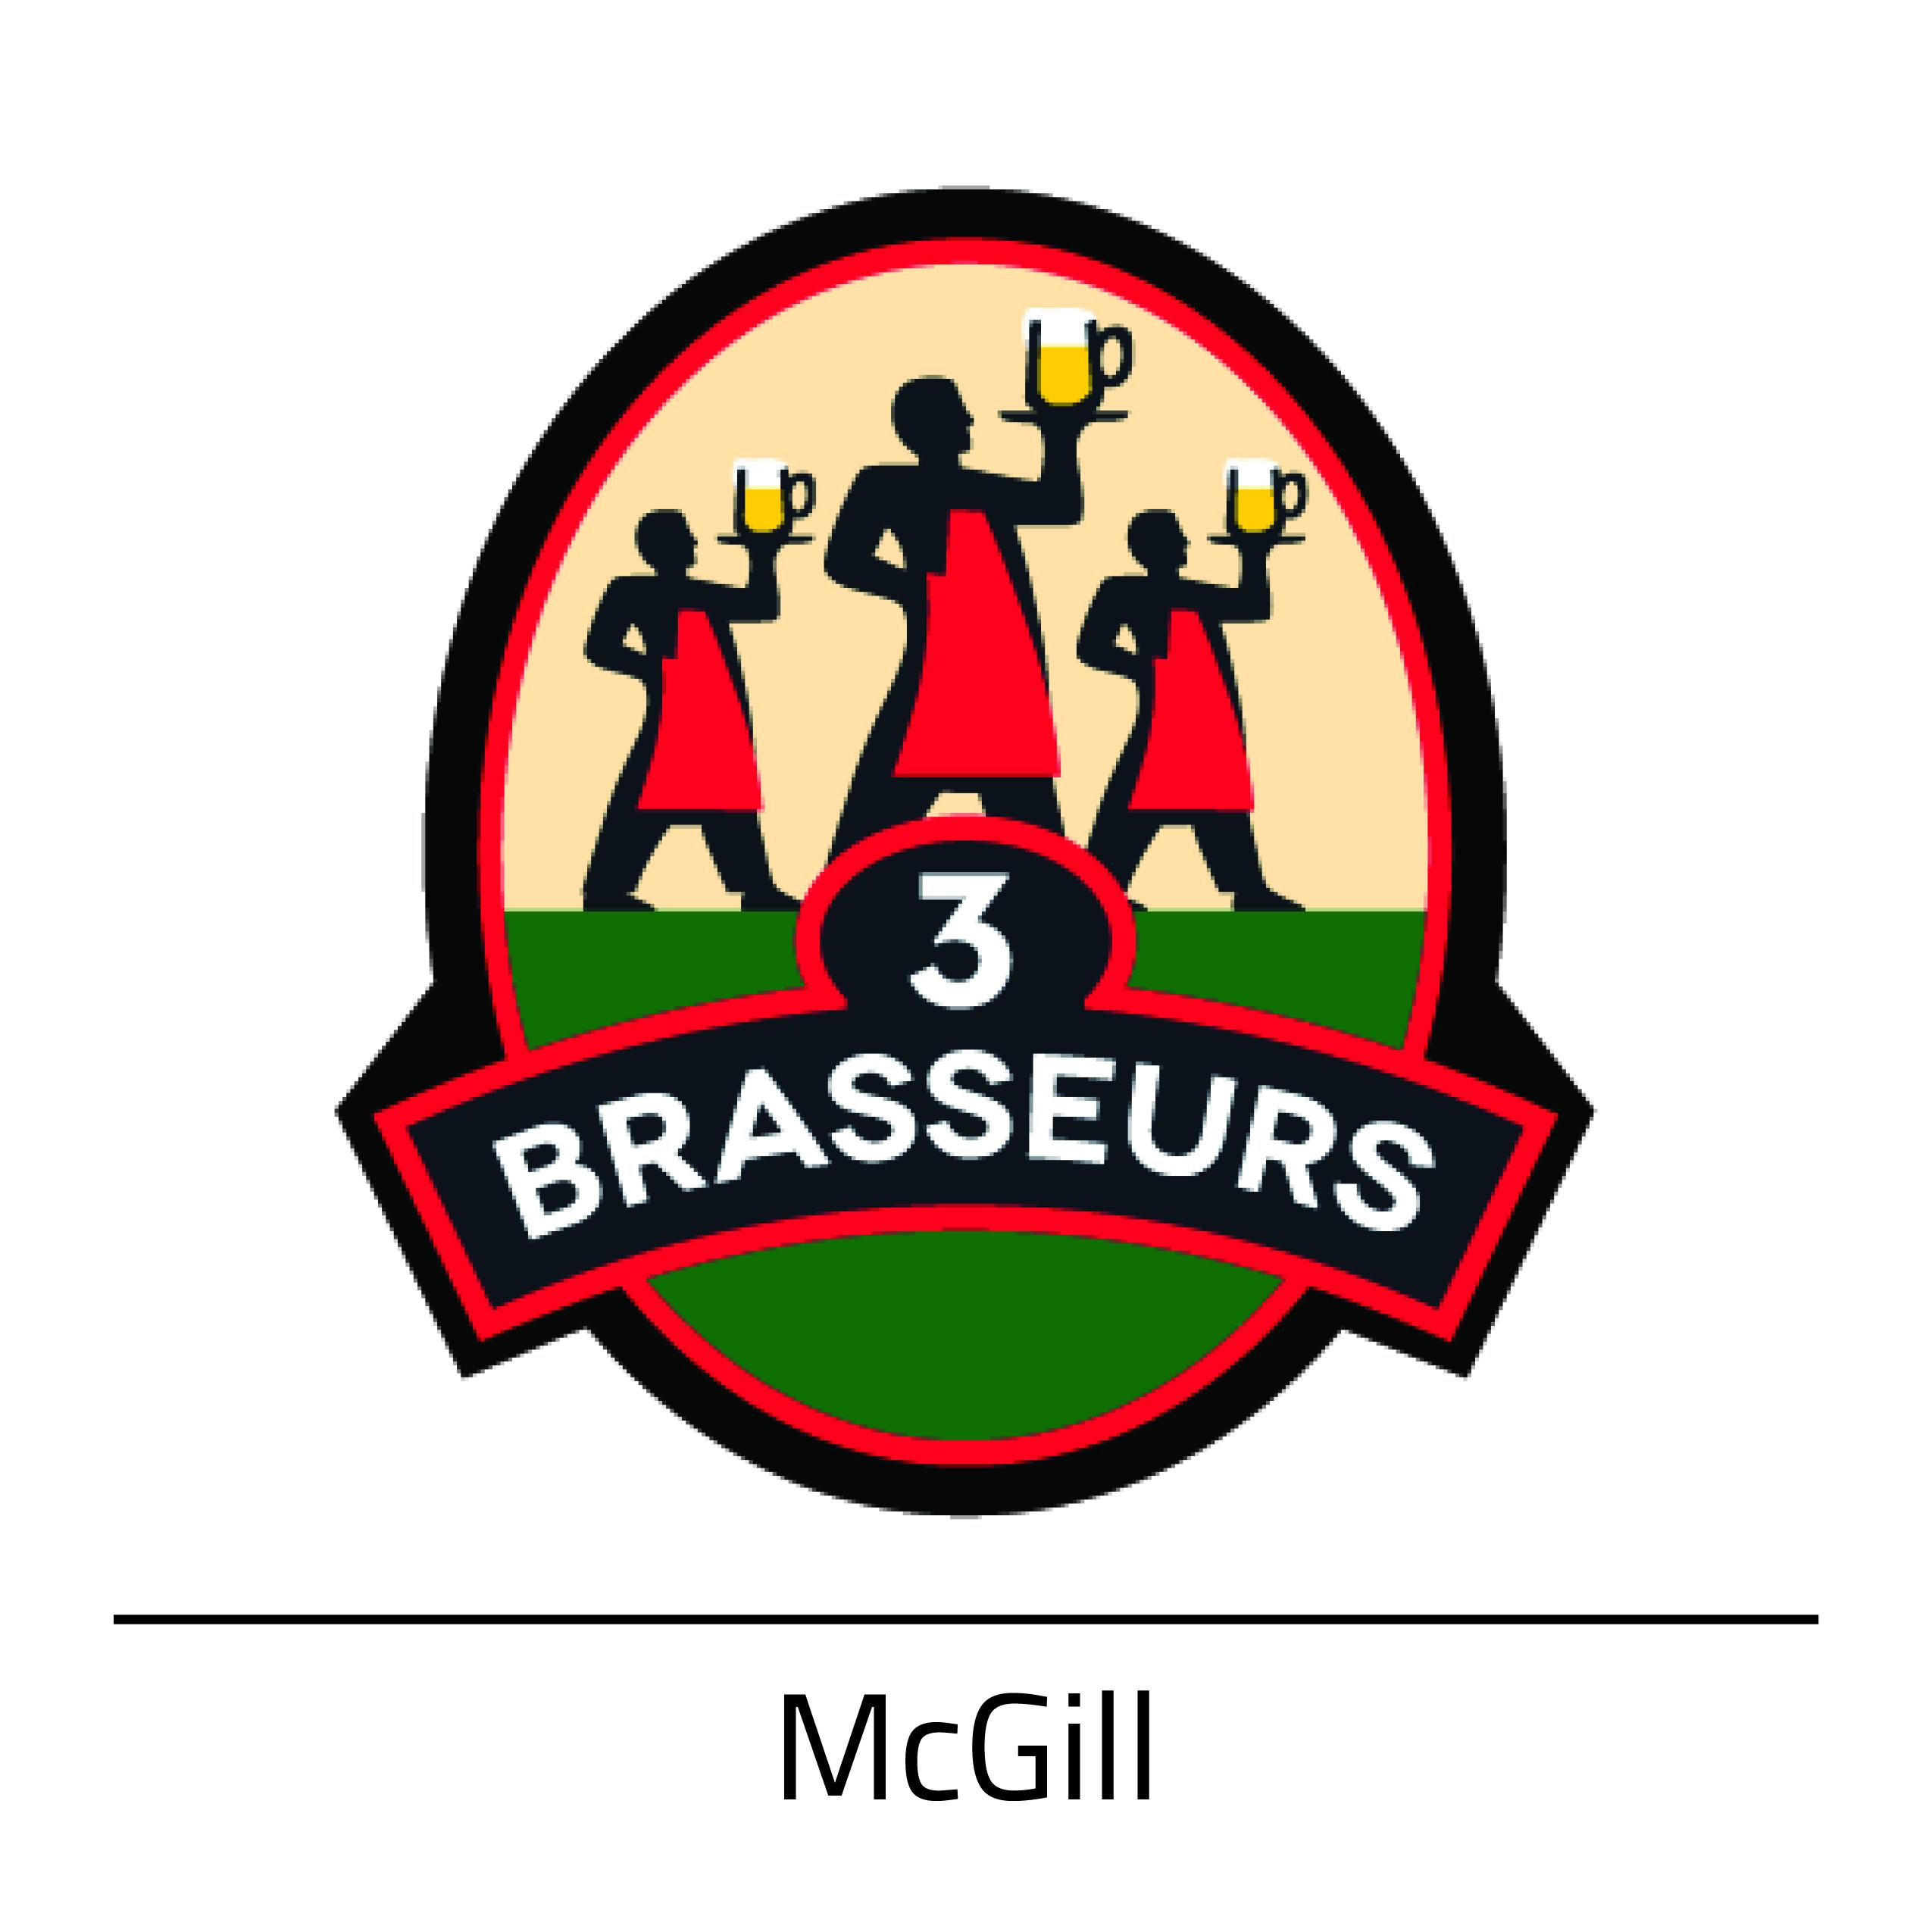 3 Brasseurs McGill